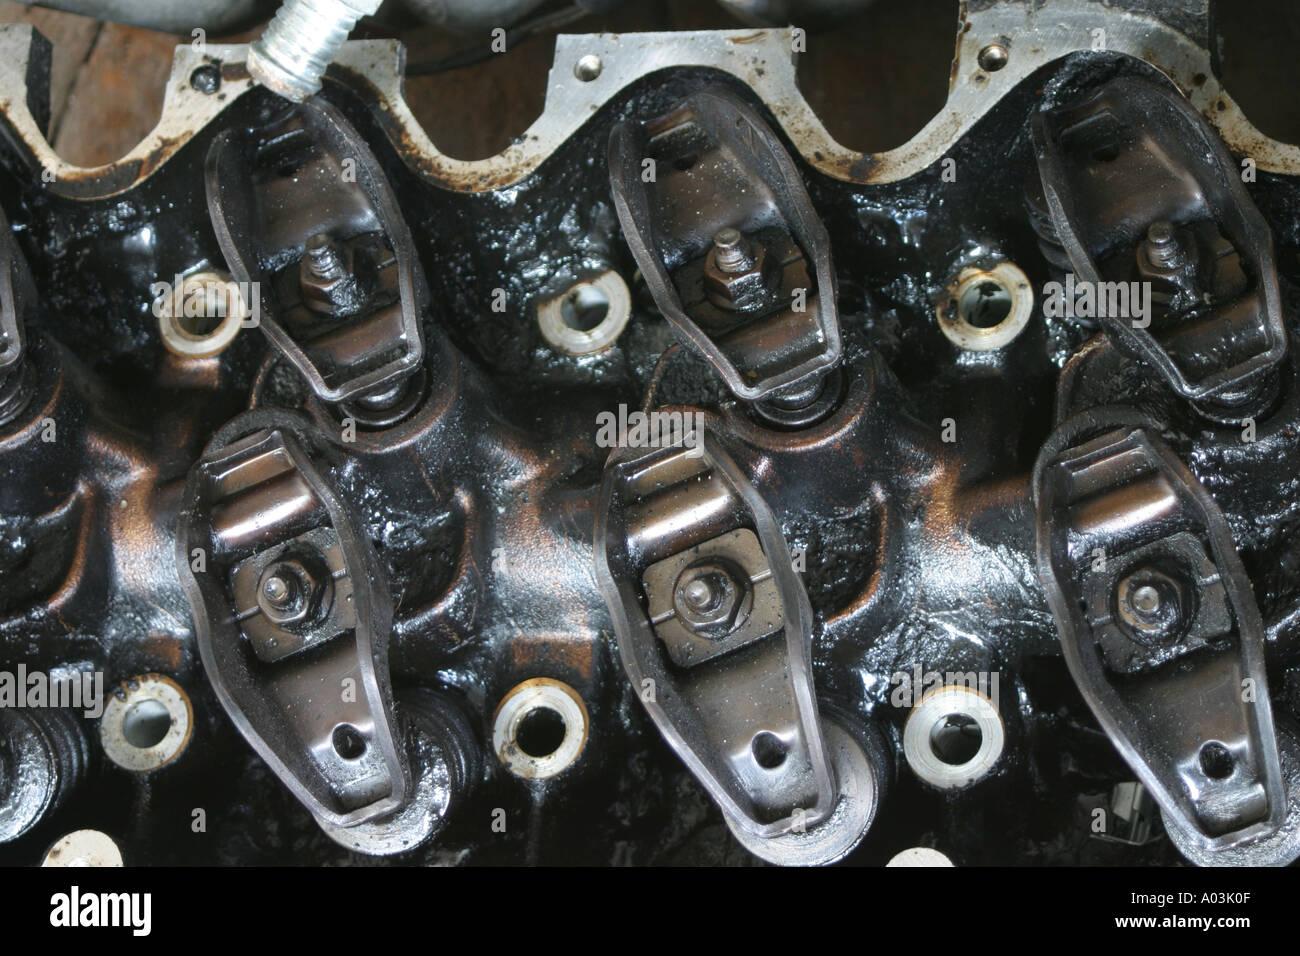 no longer used cylinder head - Stock Image